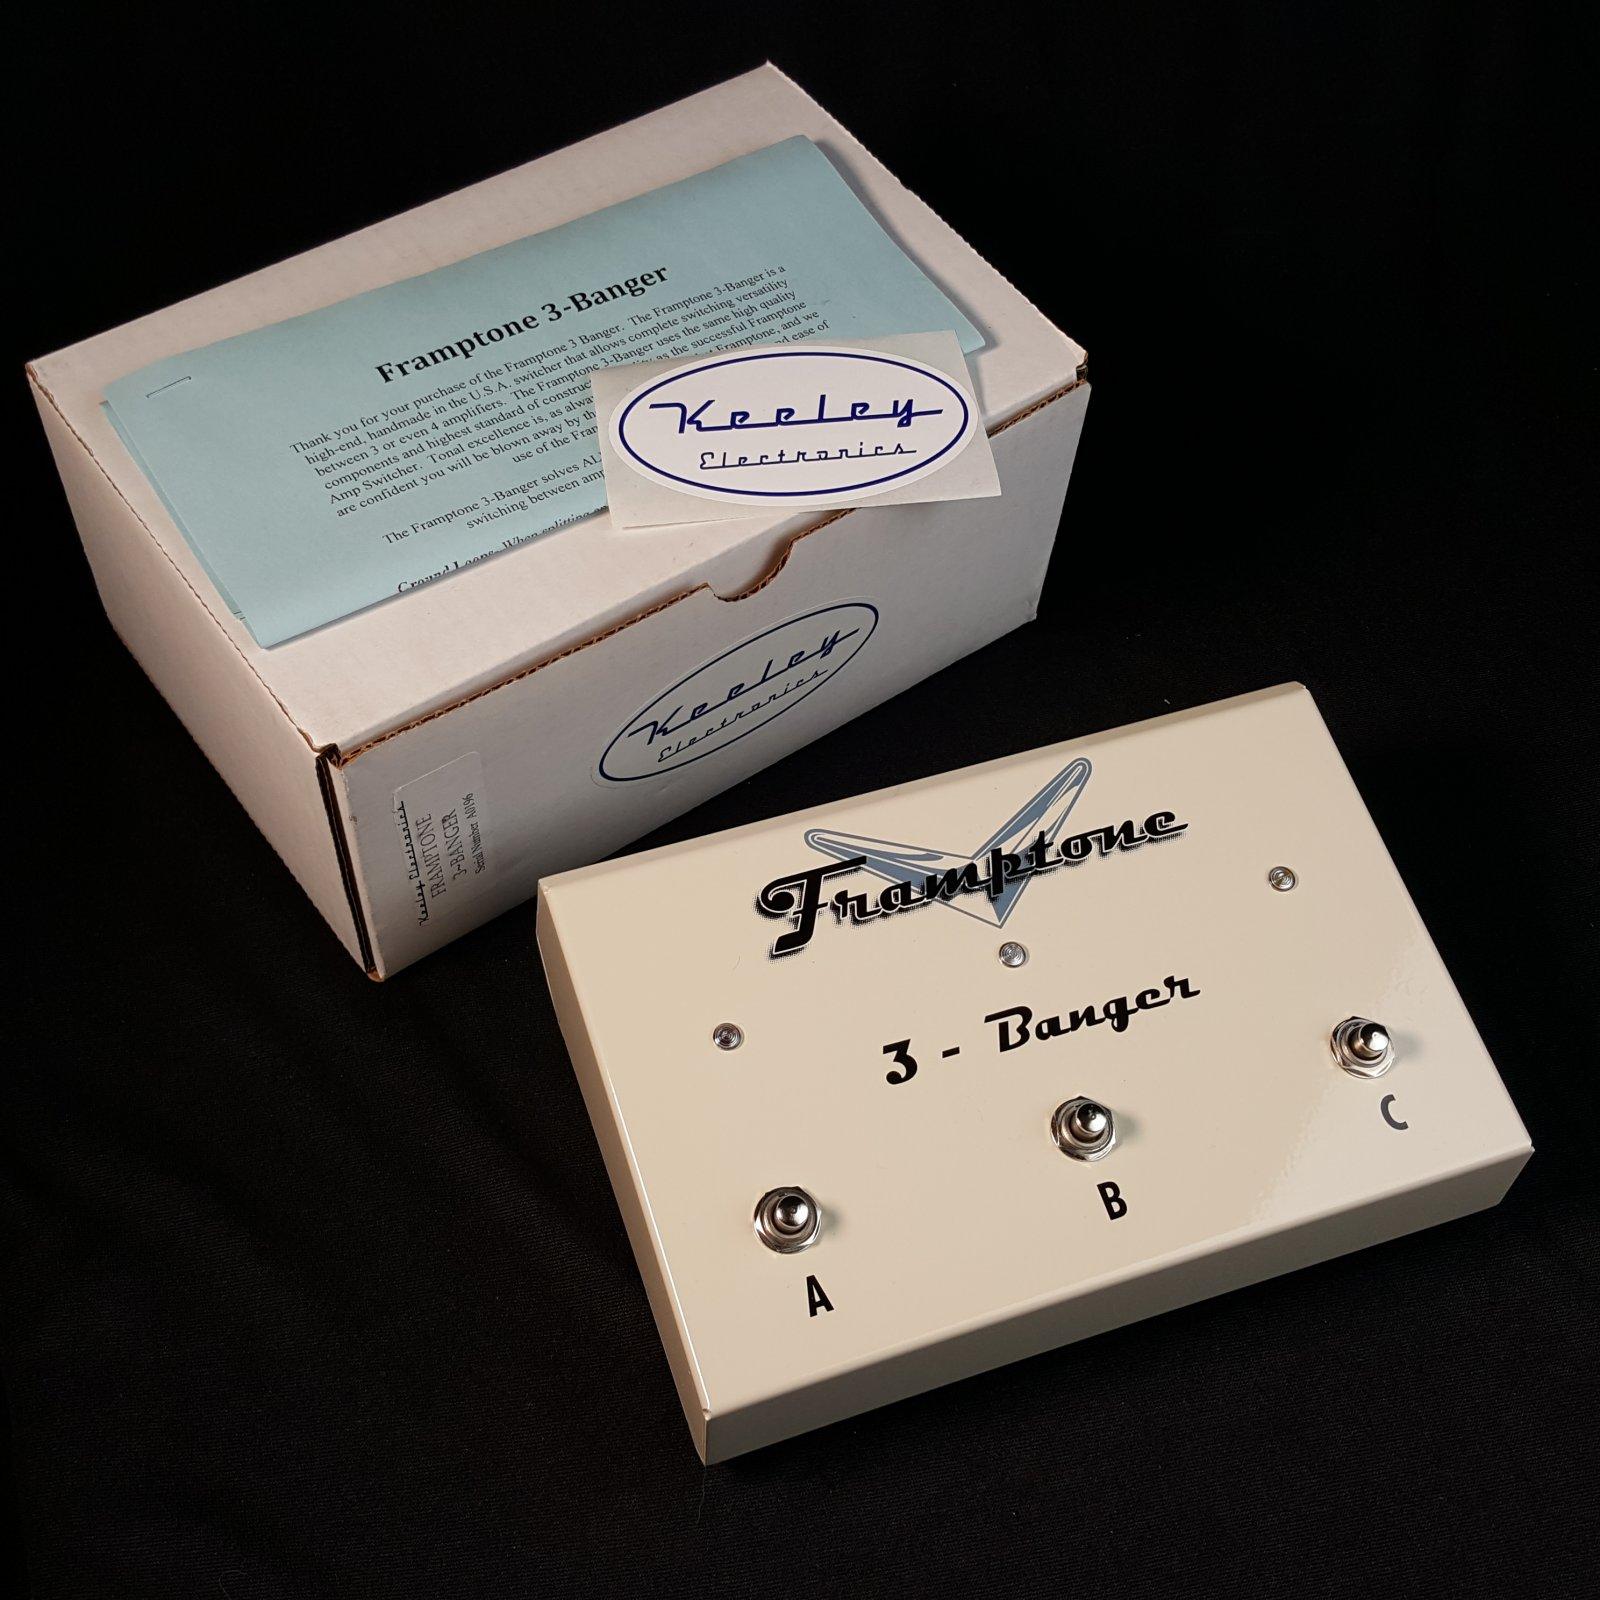 Used Keeley Electronics Framptone 3-Banger Amplifier Selector